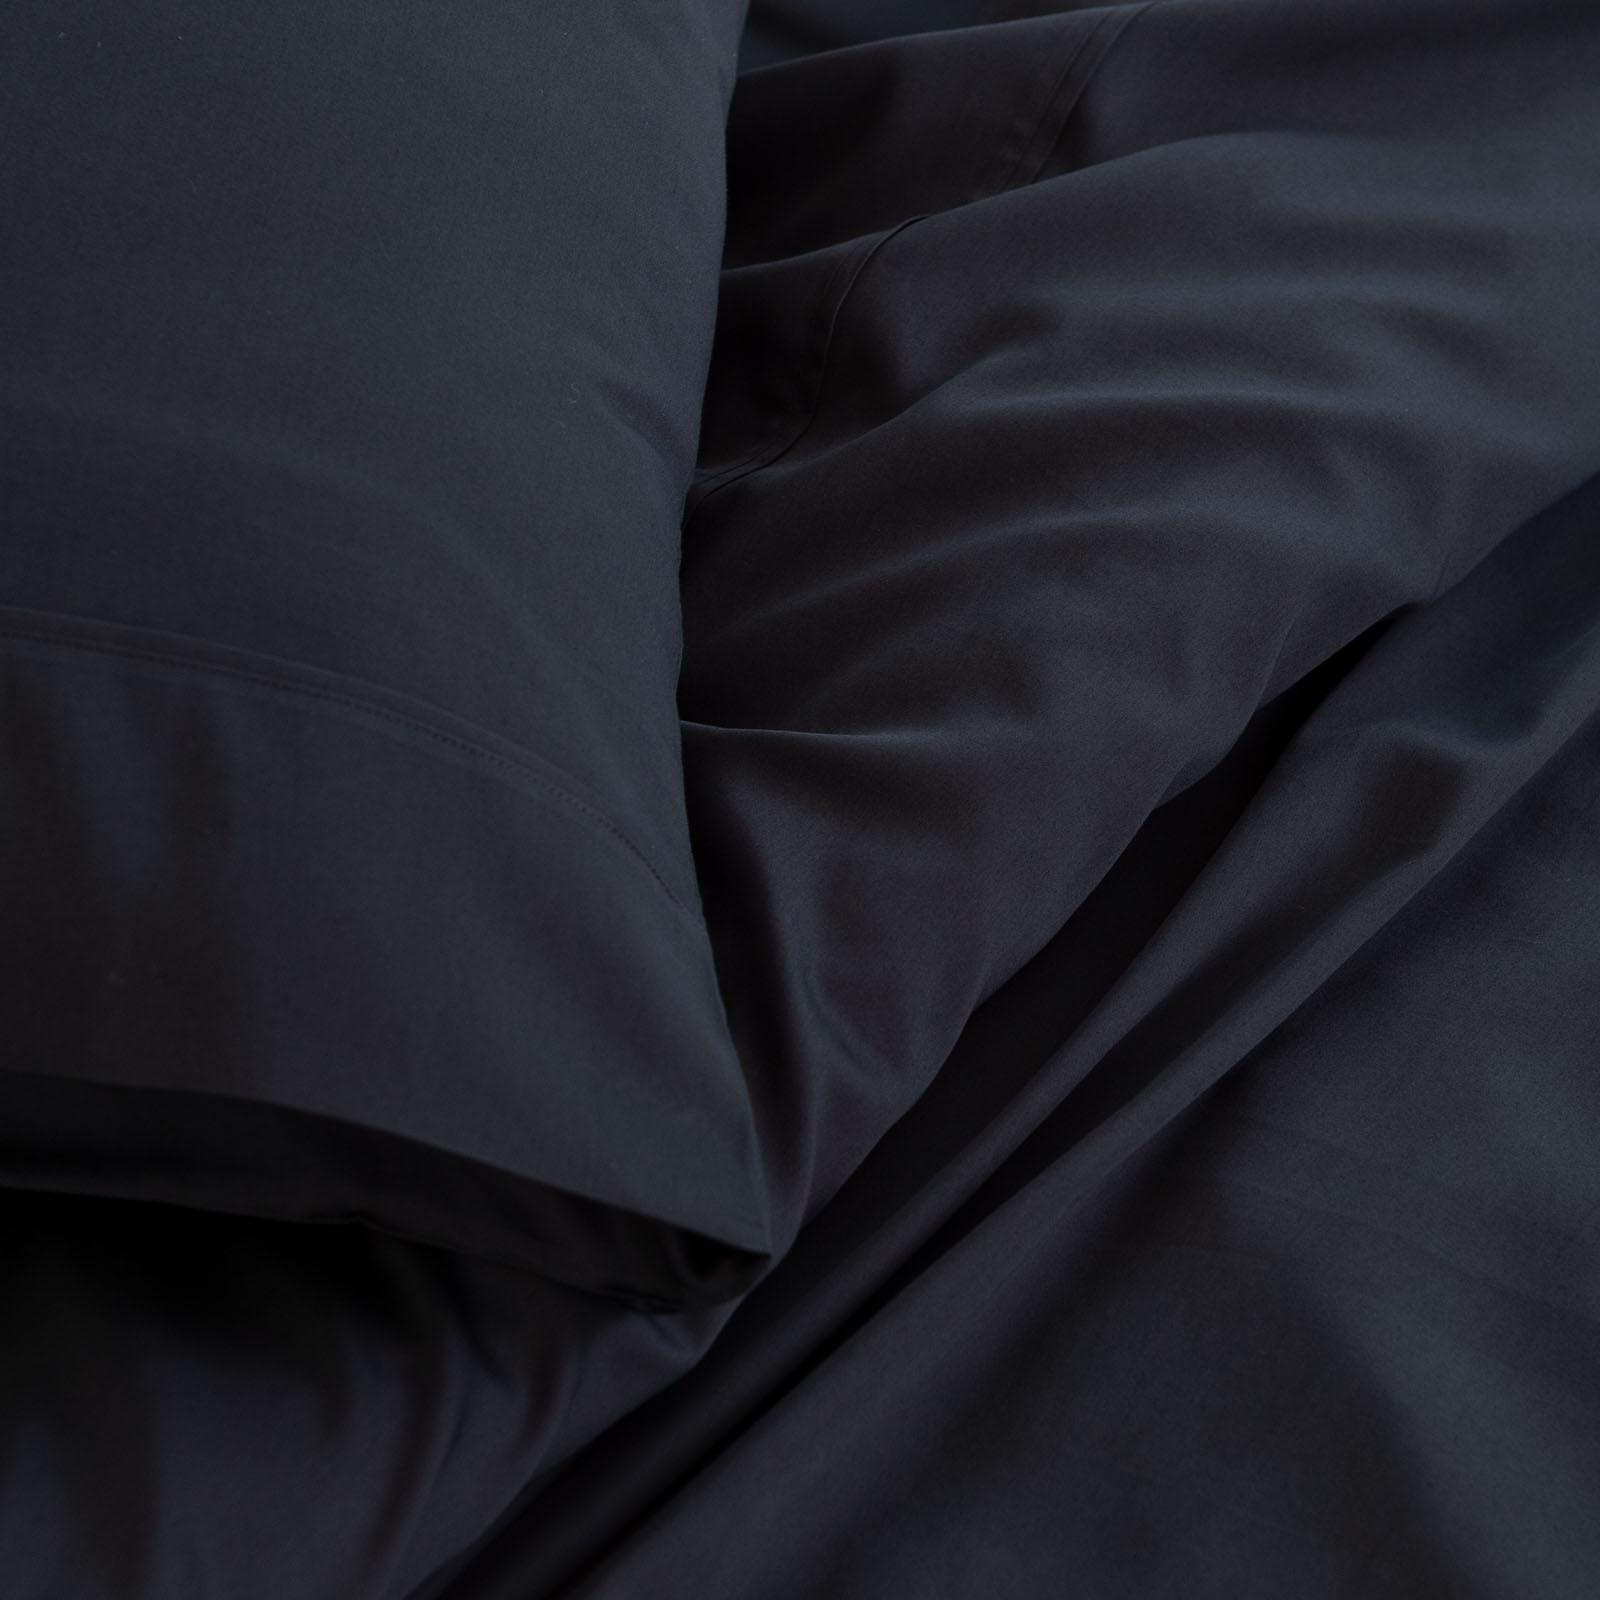 thumbnail 31 - Royal Comfort 1000TC Hotel Grade Bamboo Cotton Sheets Pillowcases Set Ultrasoft